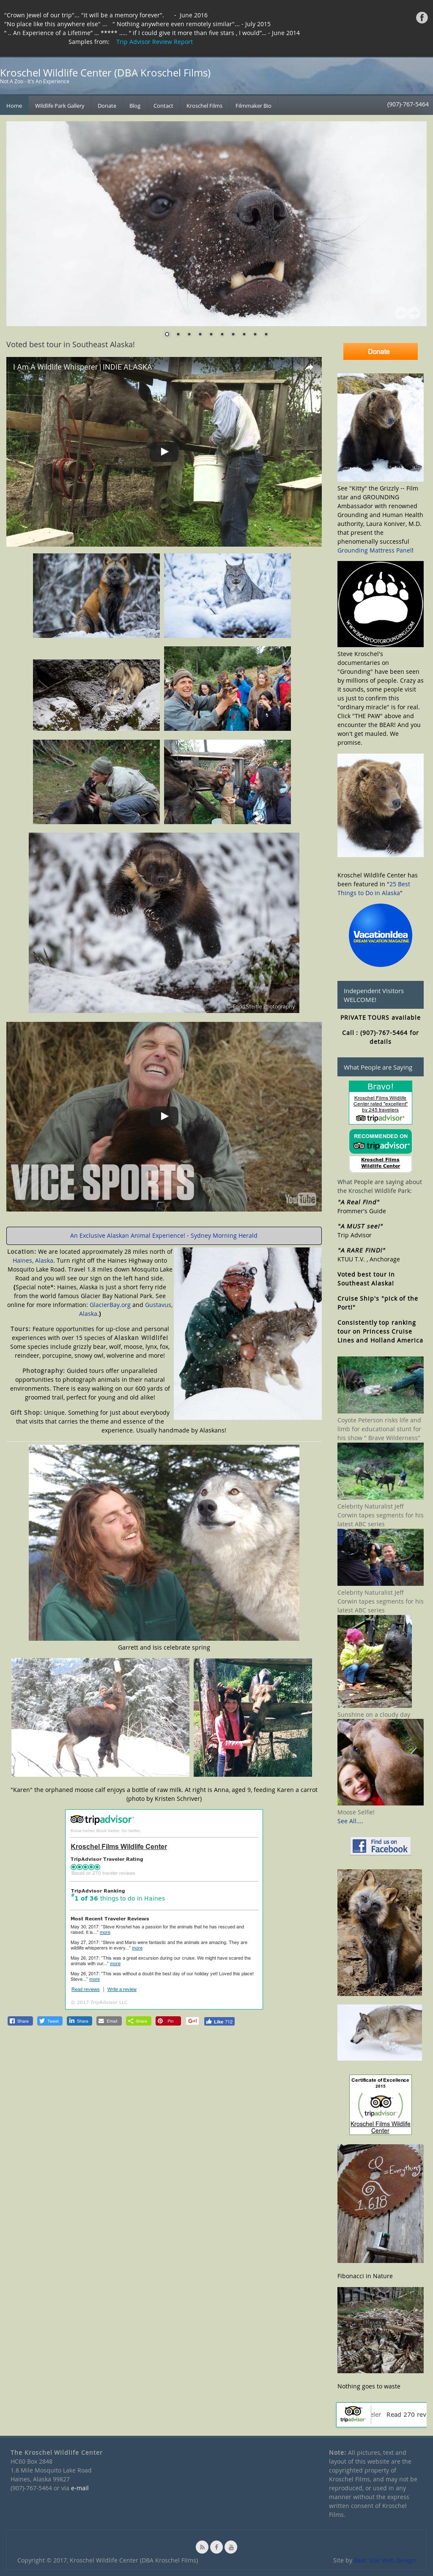 The Kroschel Wildlife Center Competitors, Revenue and